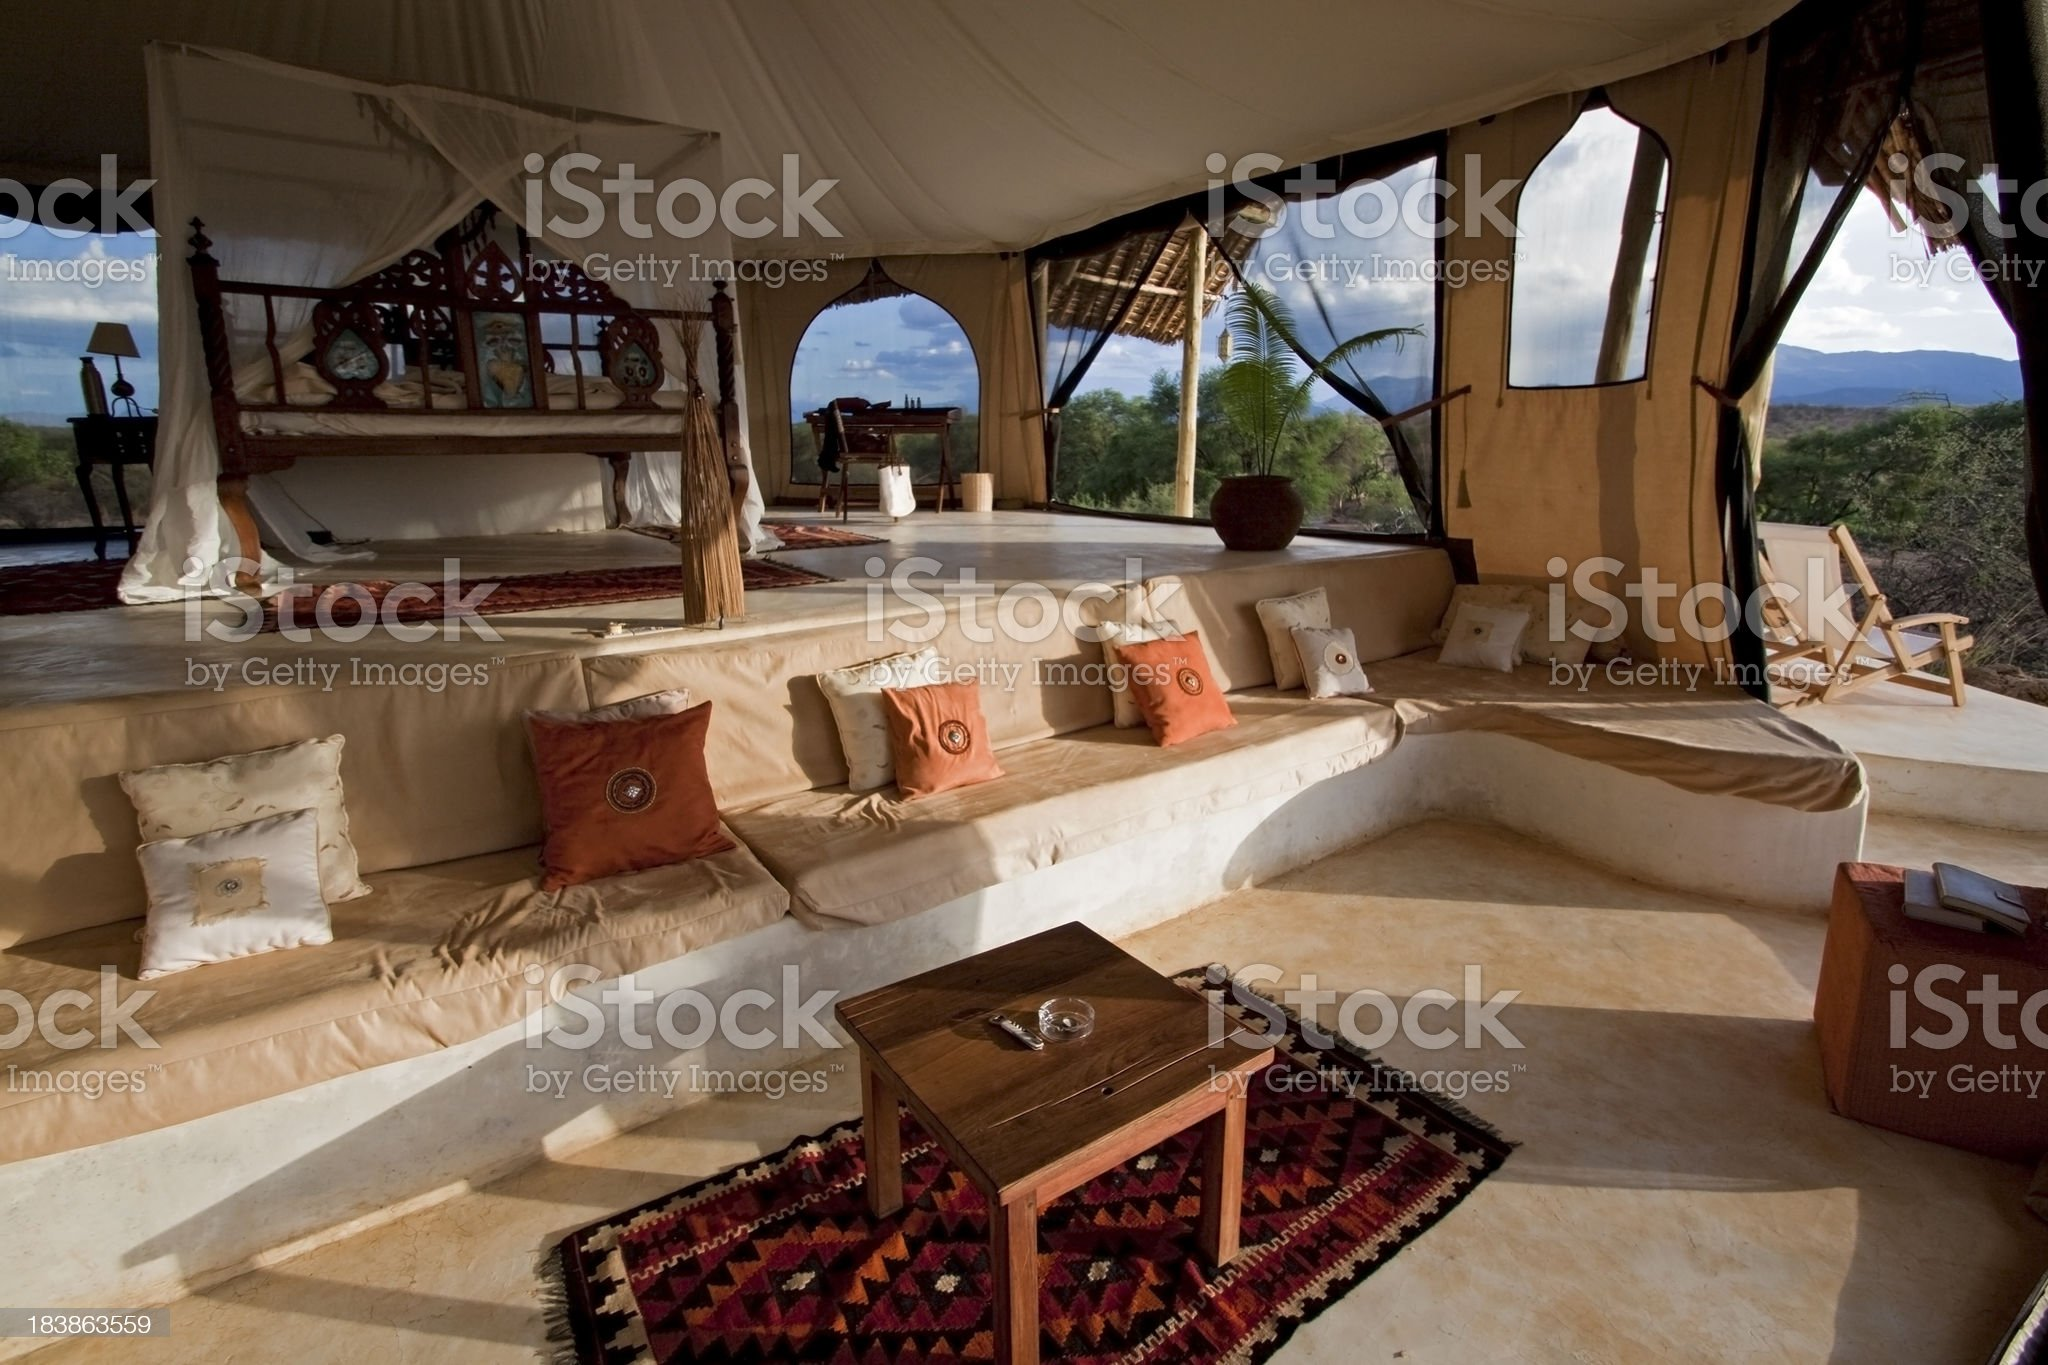 Luxury Safari Bedroom royalty-free stock photo